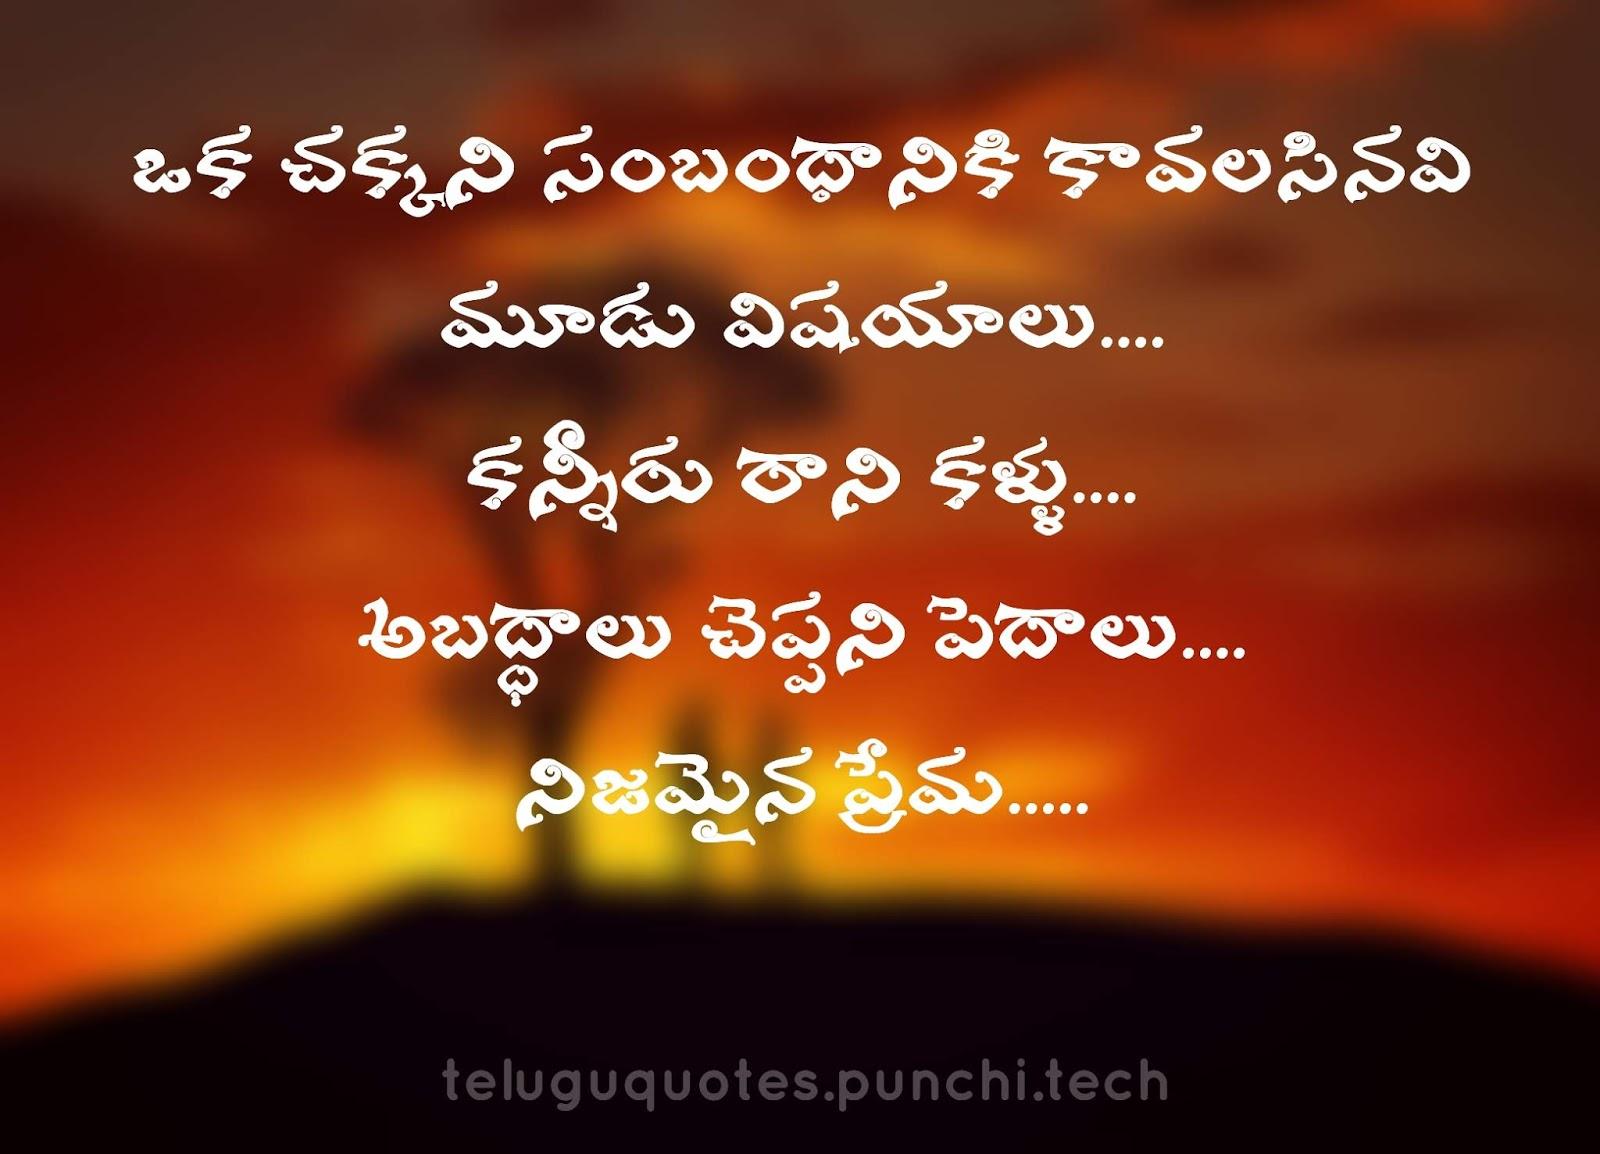 Telugu Love quotations images download